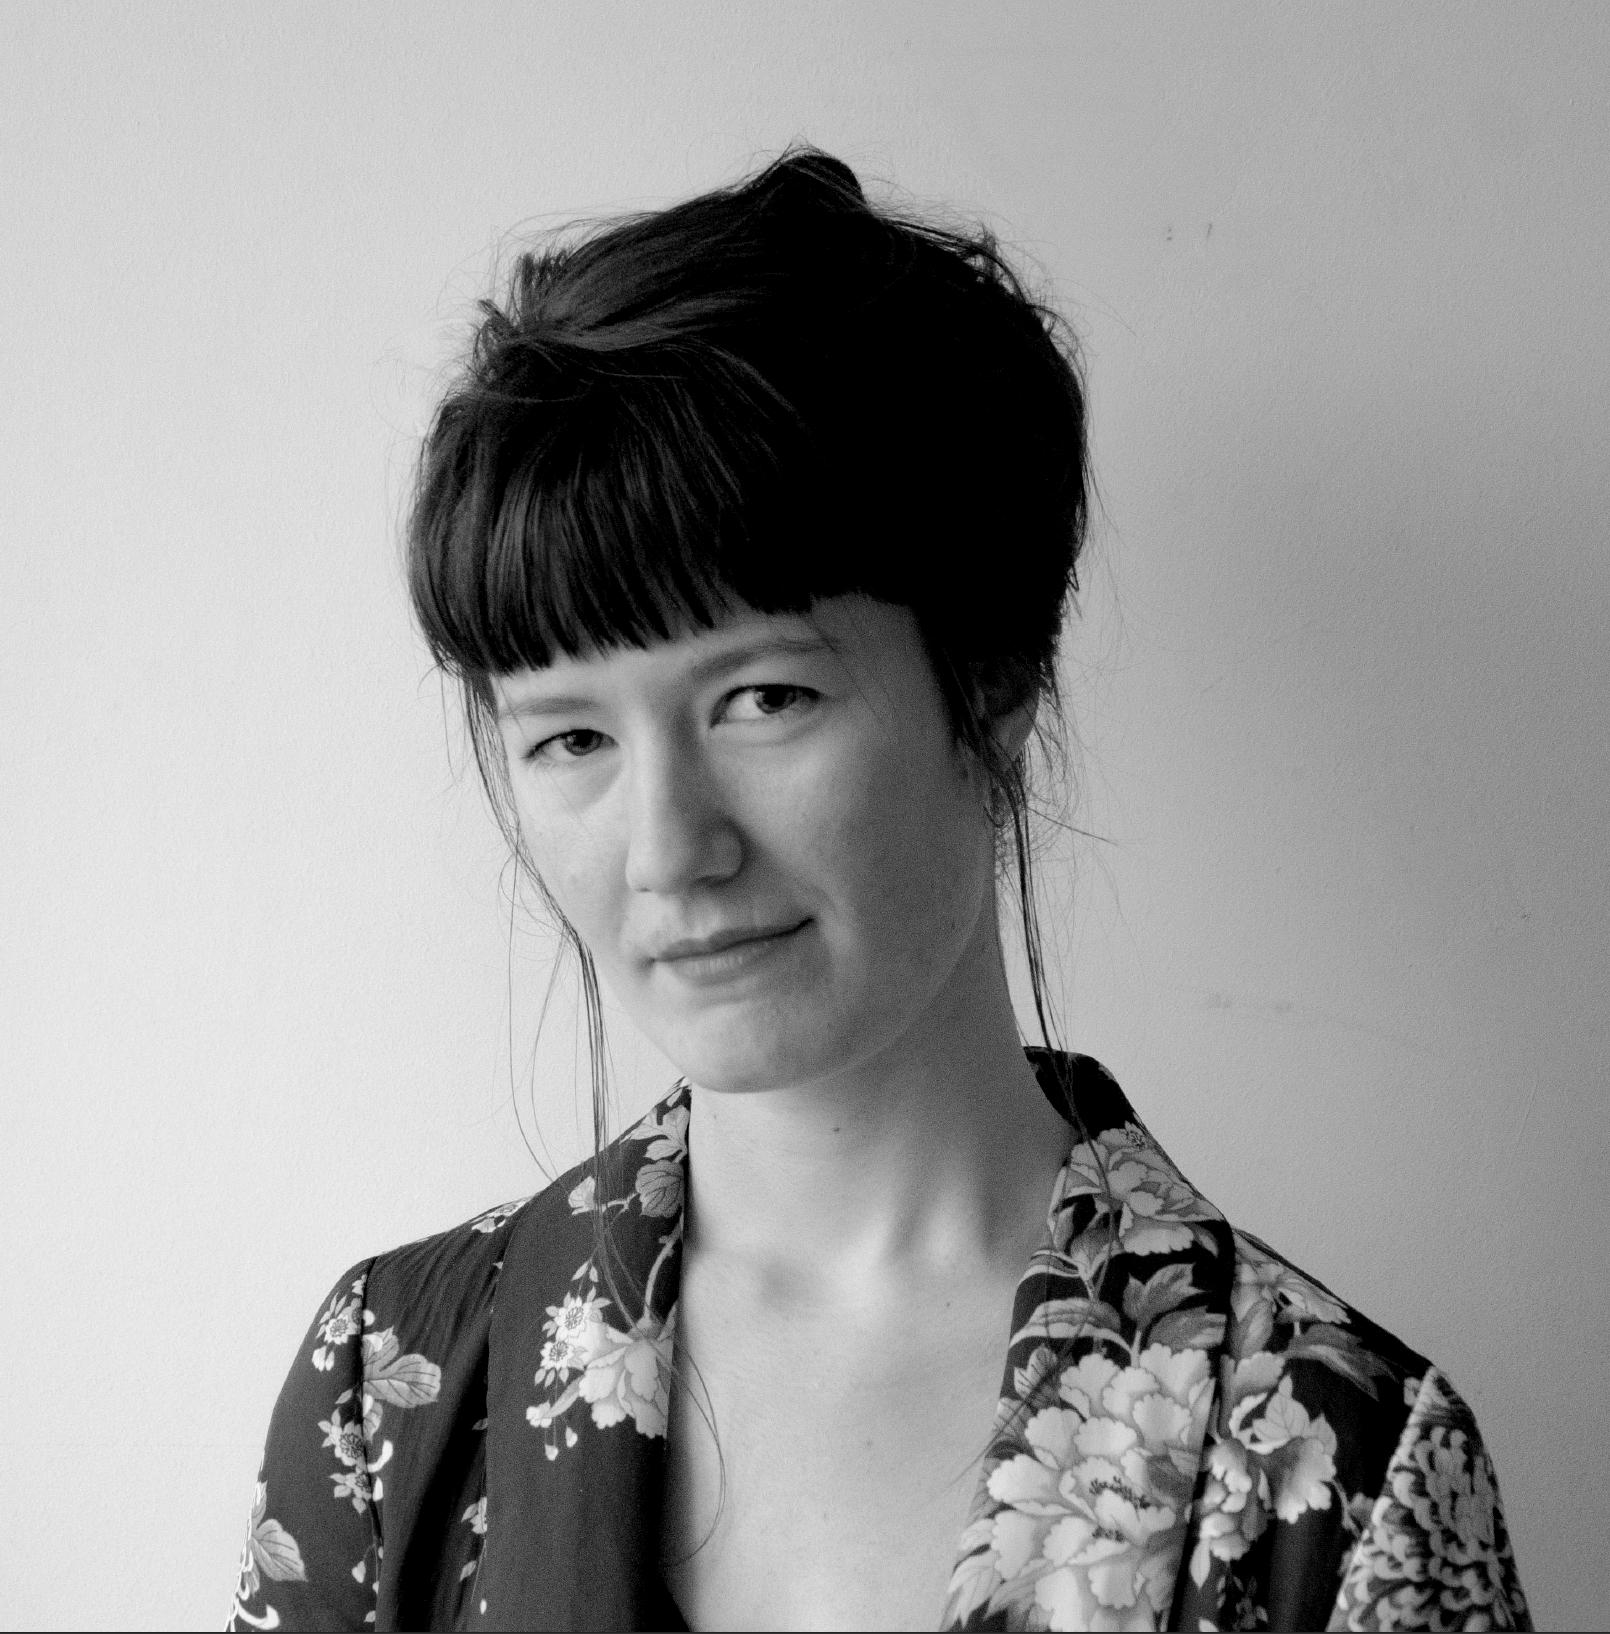 Maria Emilie Bürger